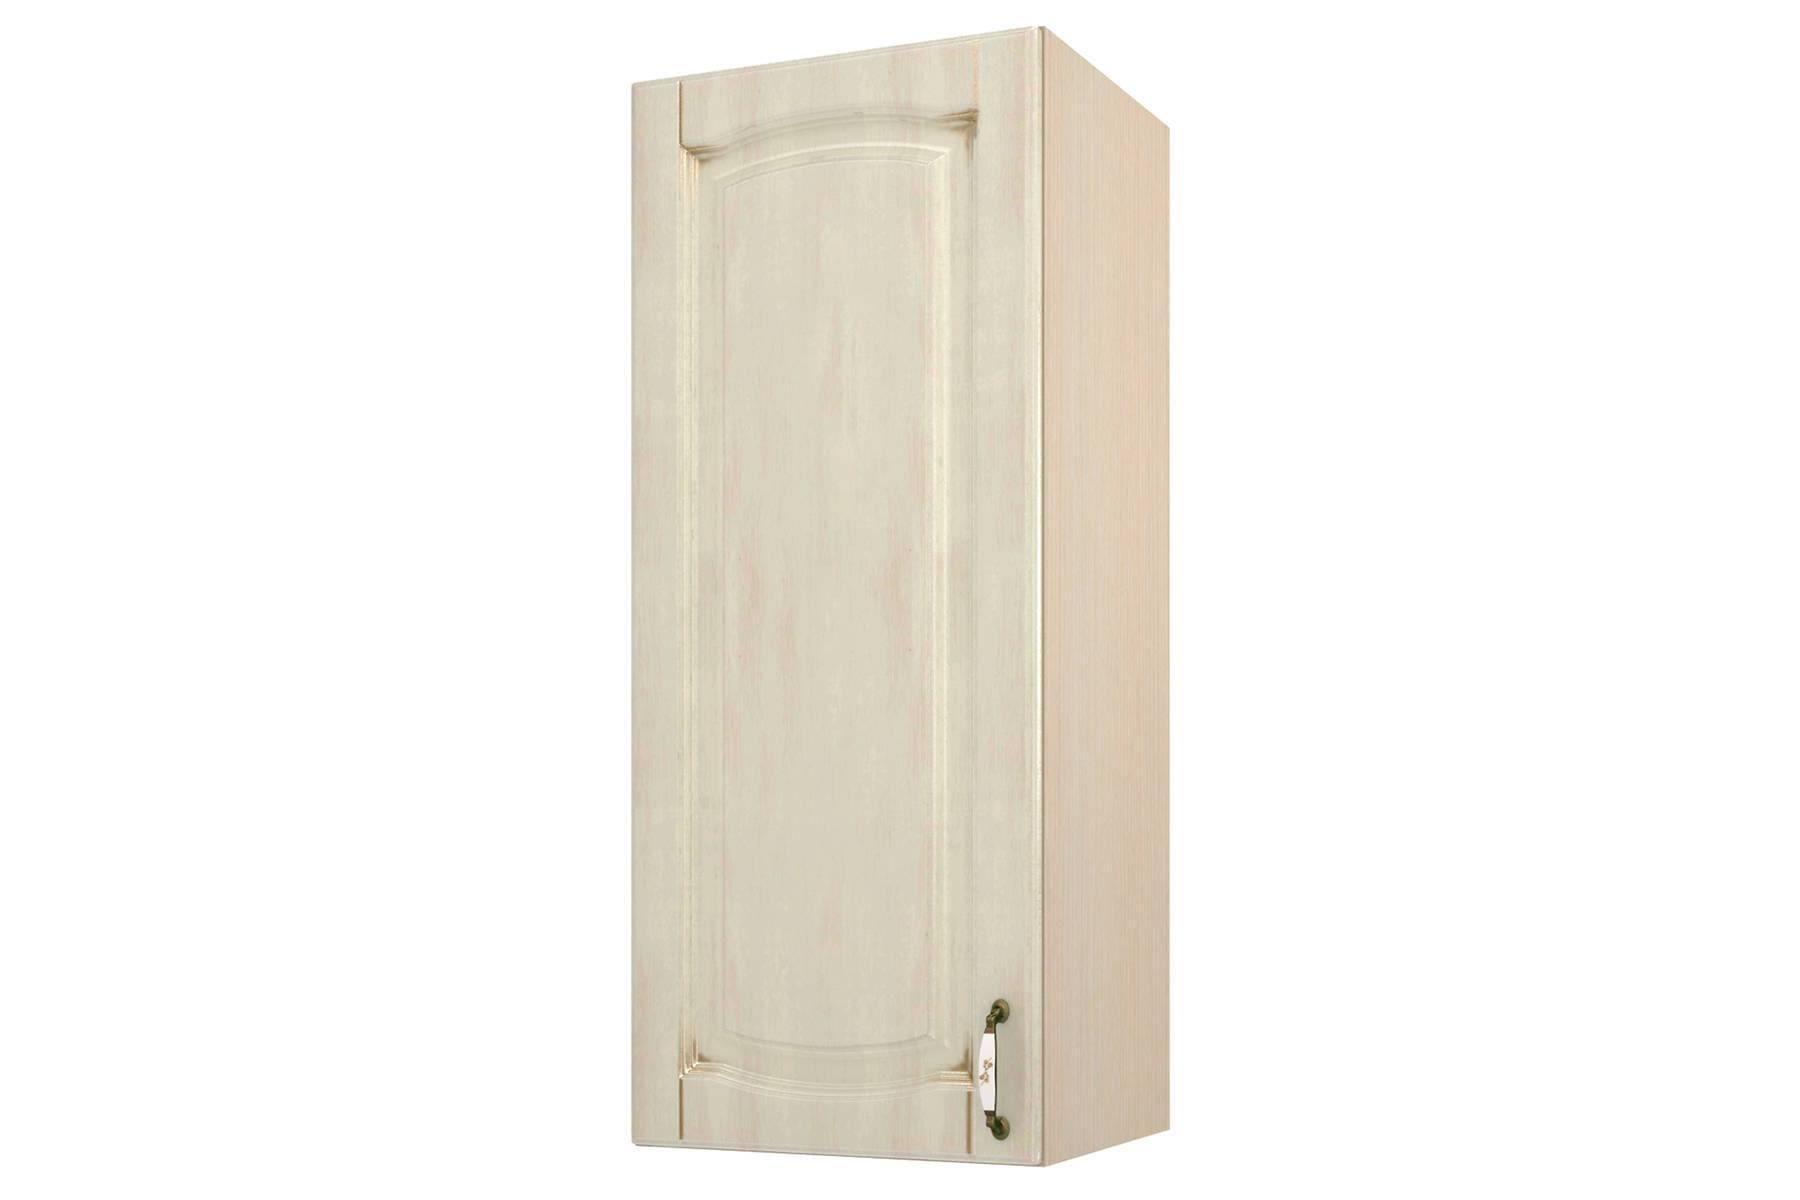 Равенна шкаф навесной 40, Н-96 равенна art шкаф навесной 40 н 96 1 дверь